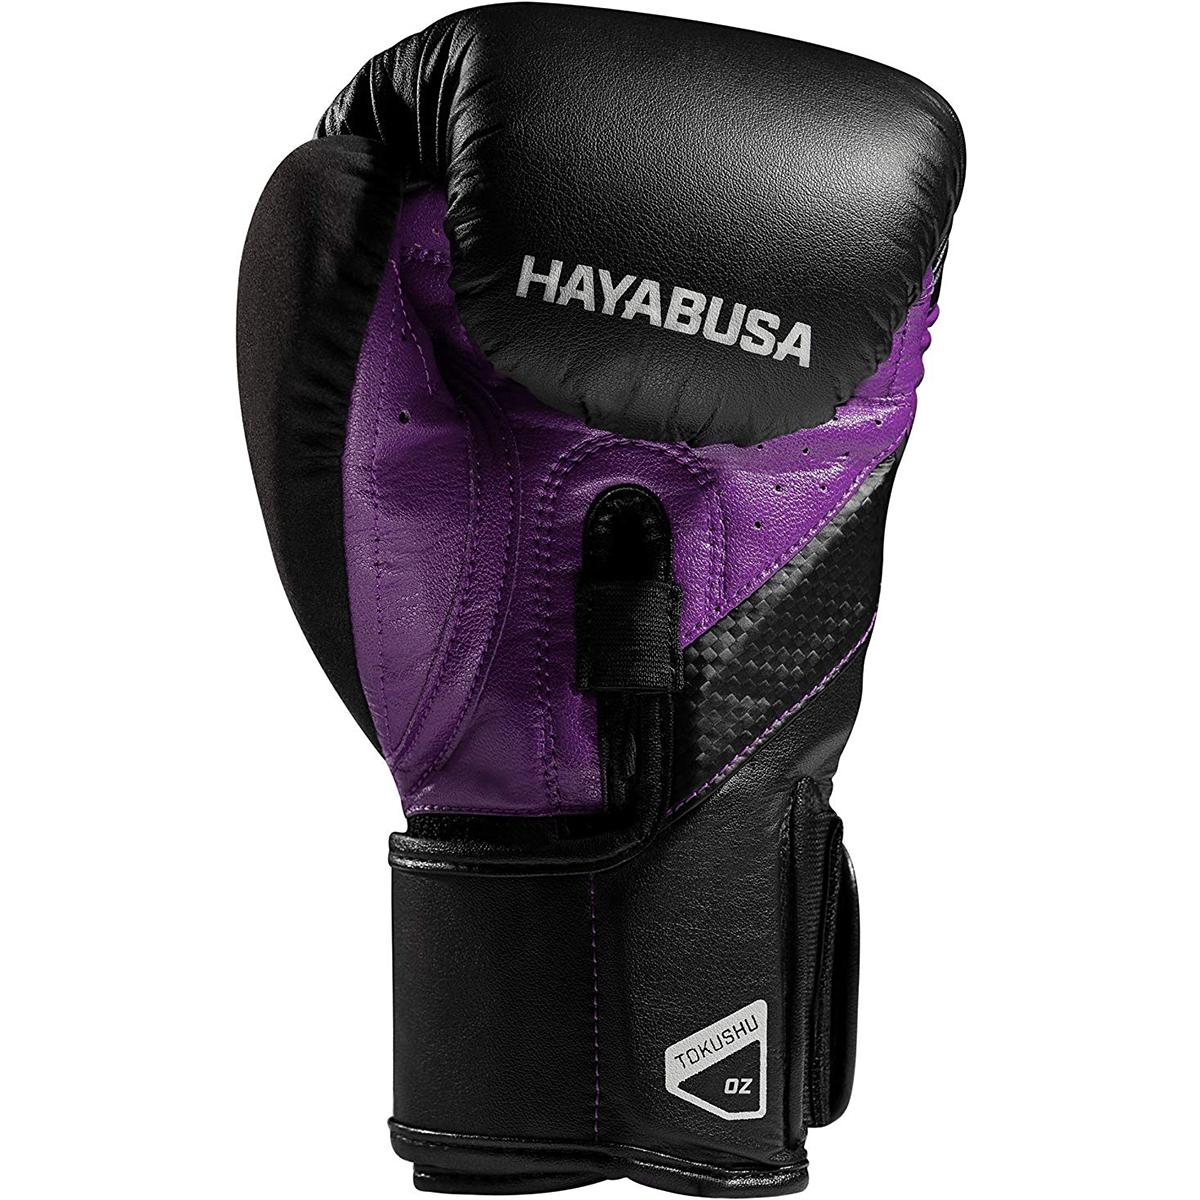 Hayabusa-T3-Dual-X-Hook-and-Loop-Closure-Vylar-Leather-Training-Boxing-Gloves thumbnail 17